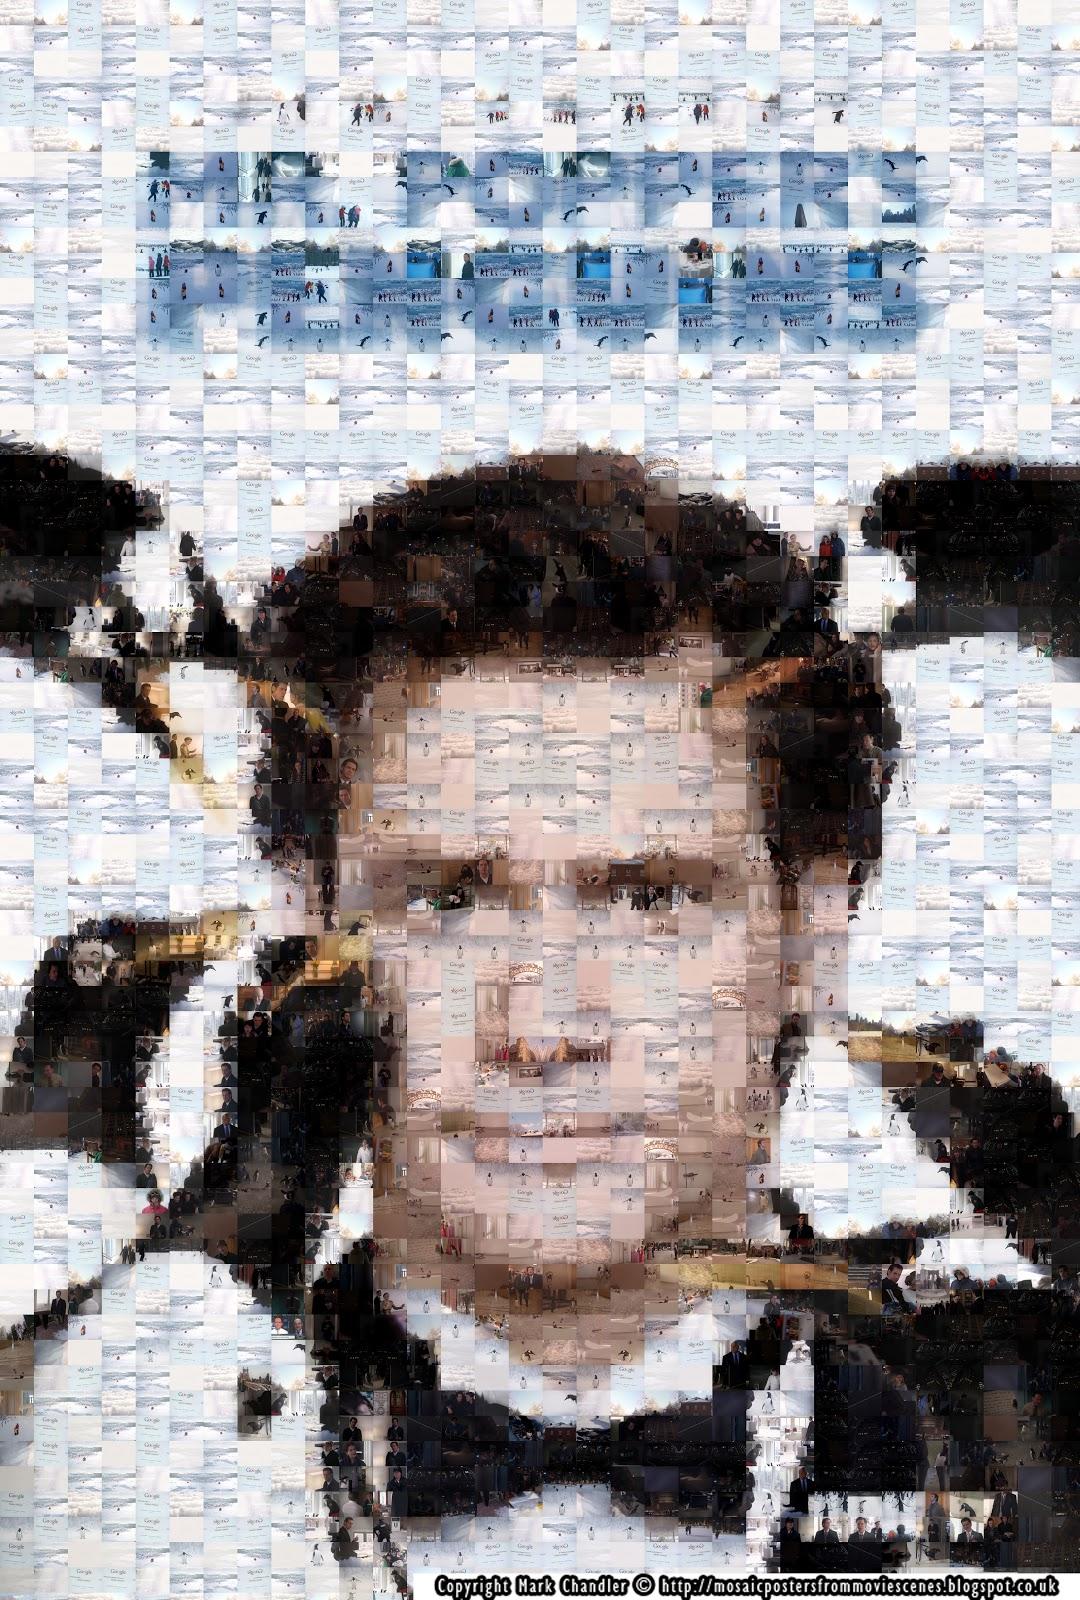 http://4.bp.blogspot.com/-RtJlj_DI3rM/UKsppwIyHPI/AAAAAAAABTc/XXy3KR4fj5c/s1600/Mr+Poppers+Penguins-Mosaic+5000+copy.jpg